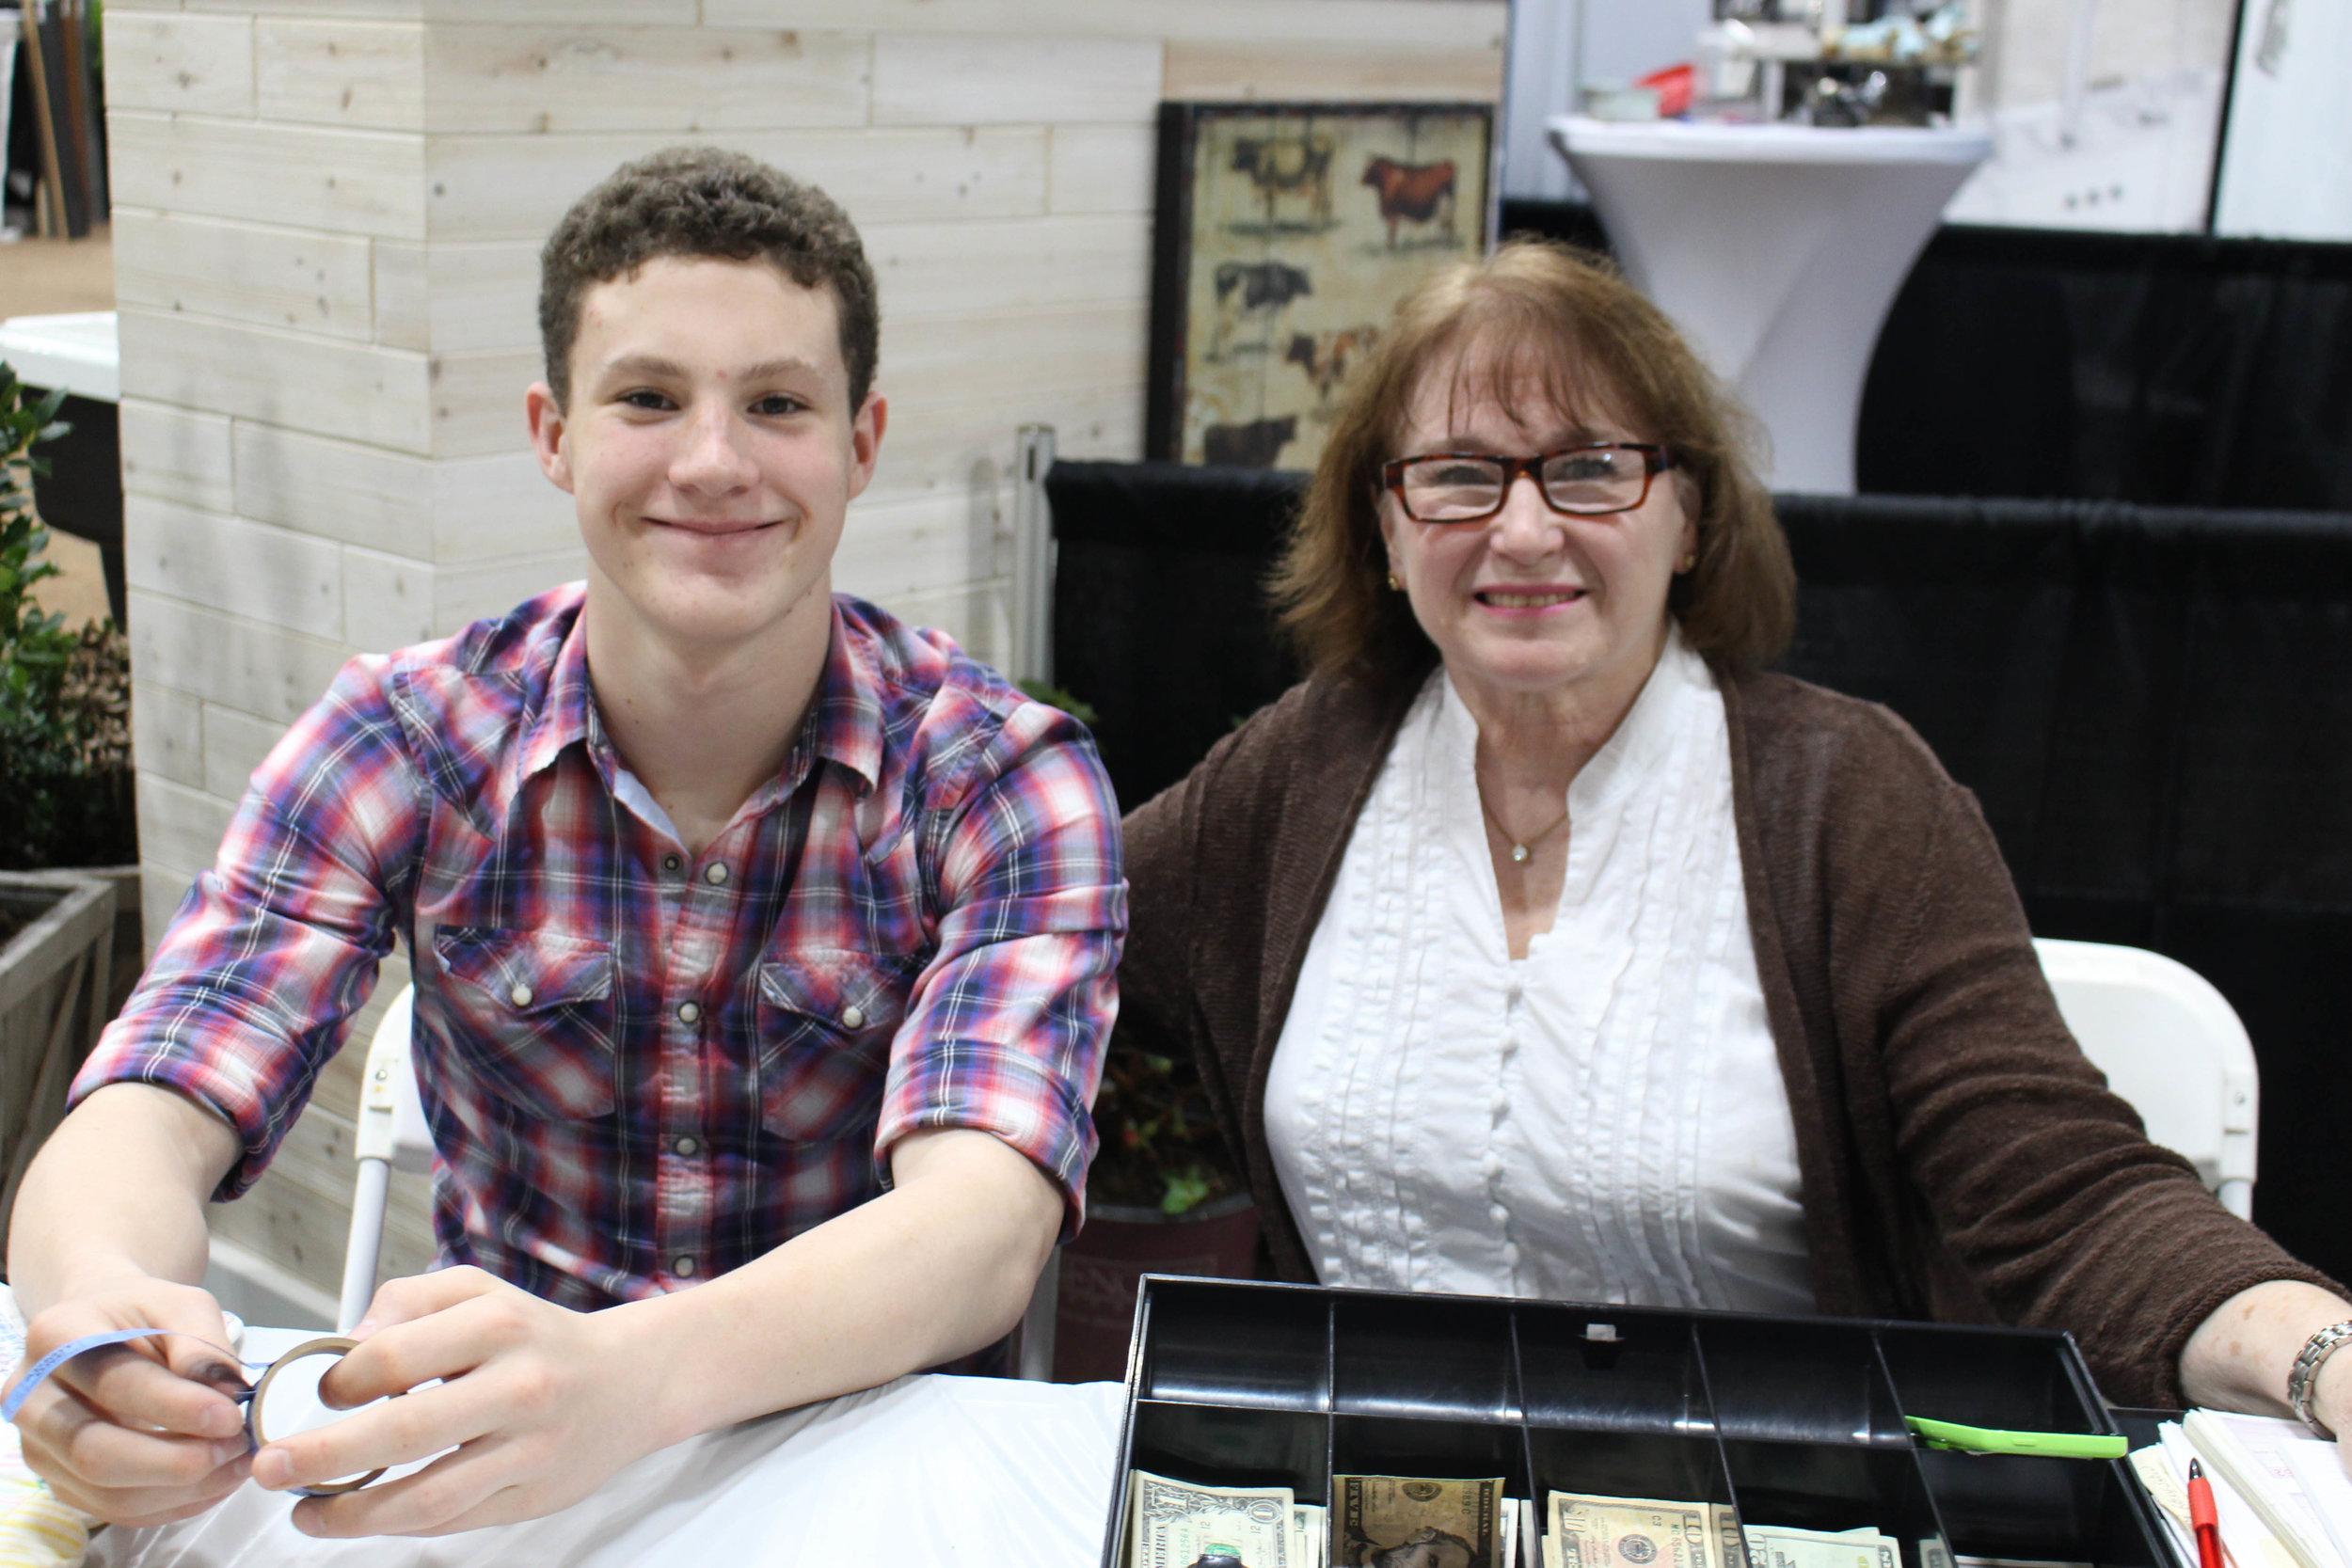 Jonah Bates and Linda Christian